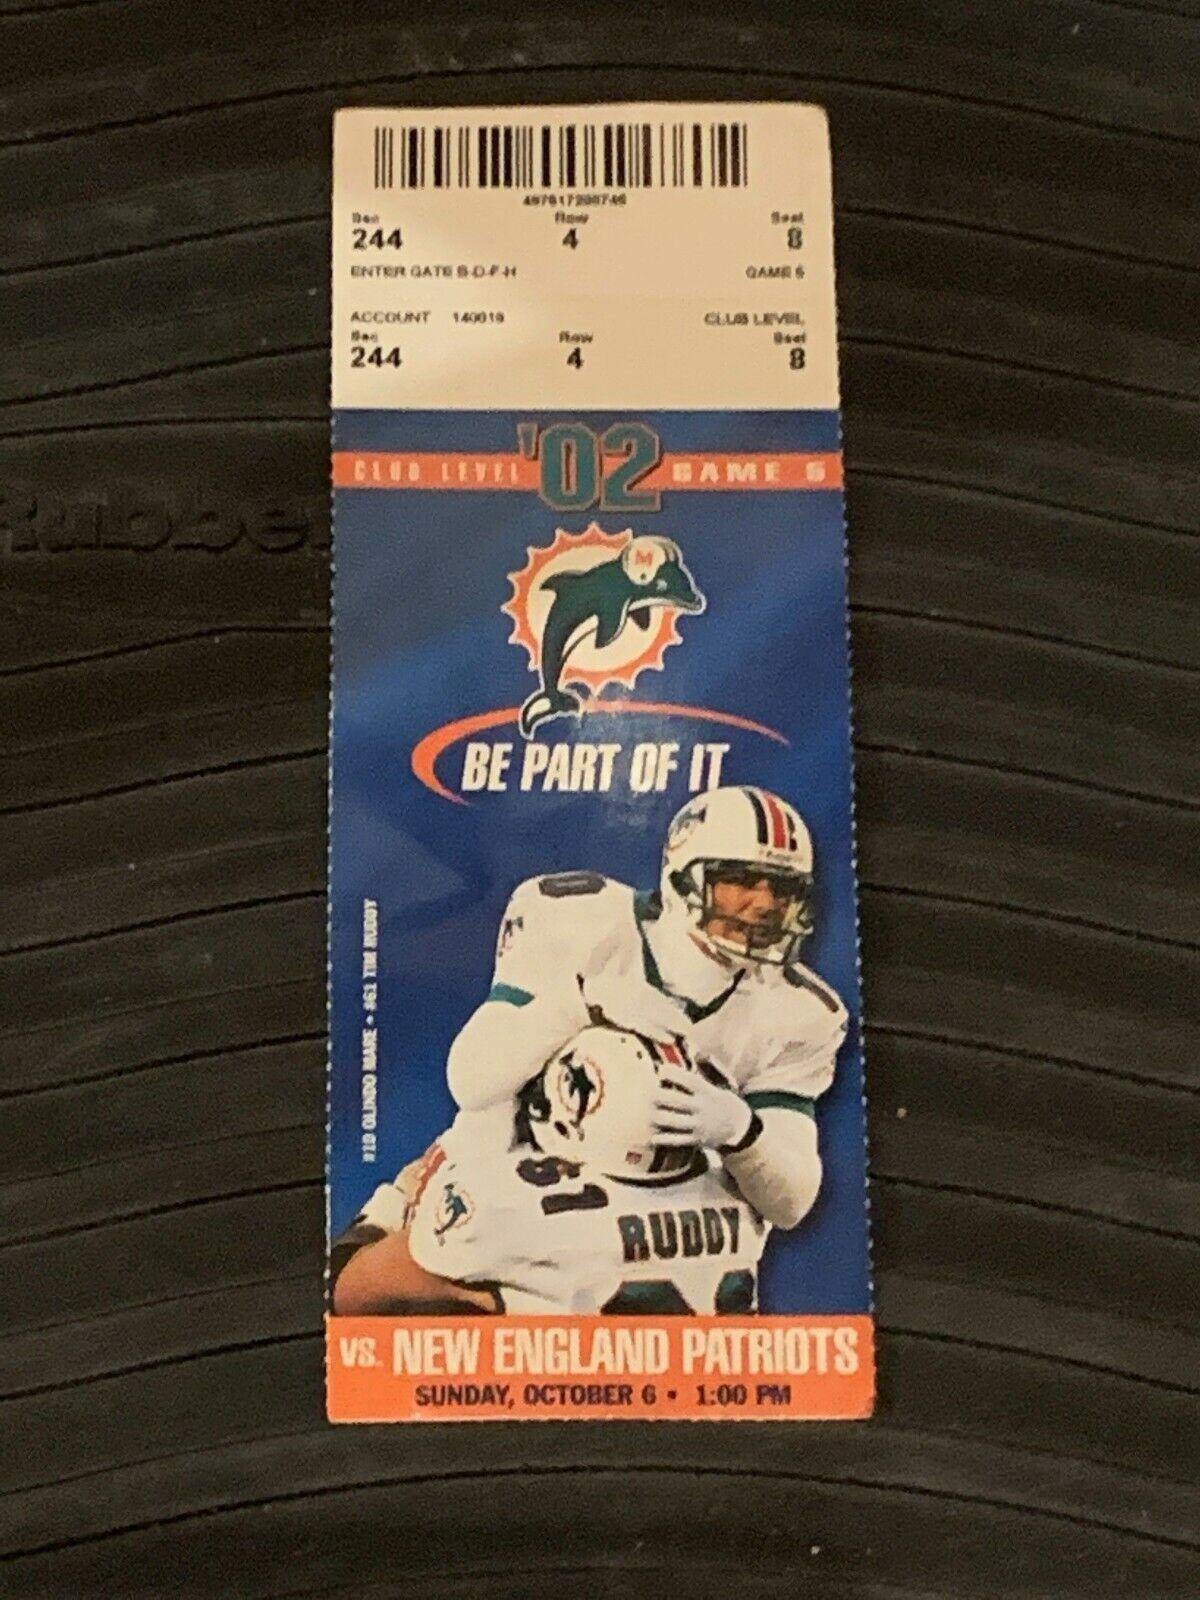 2002 Miami Dolphins v New England Patriots Football Ticket Tom Brady 2 TDs